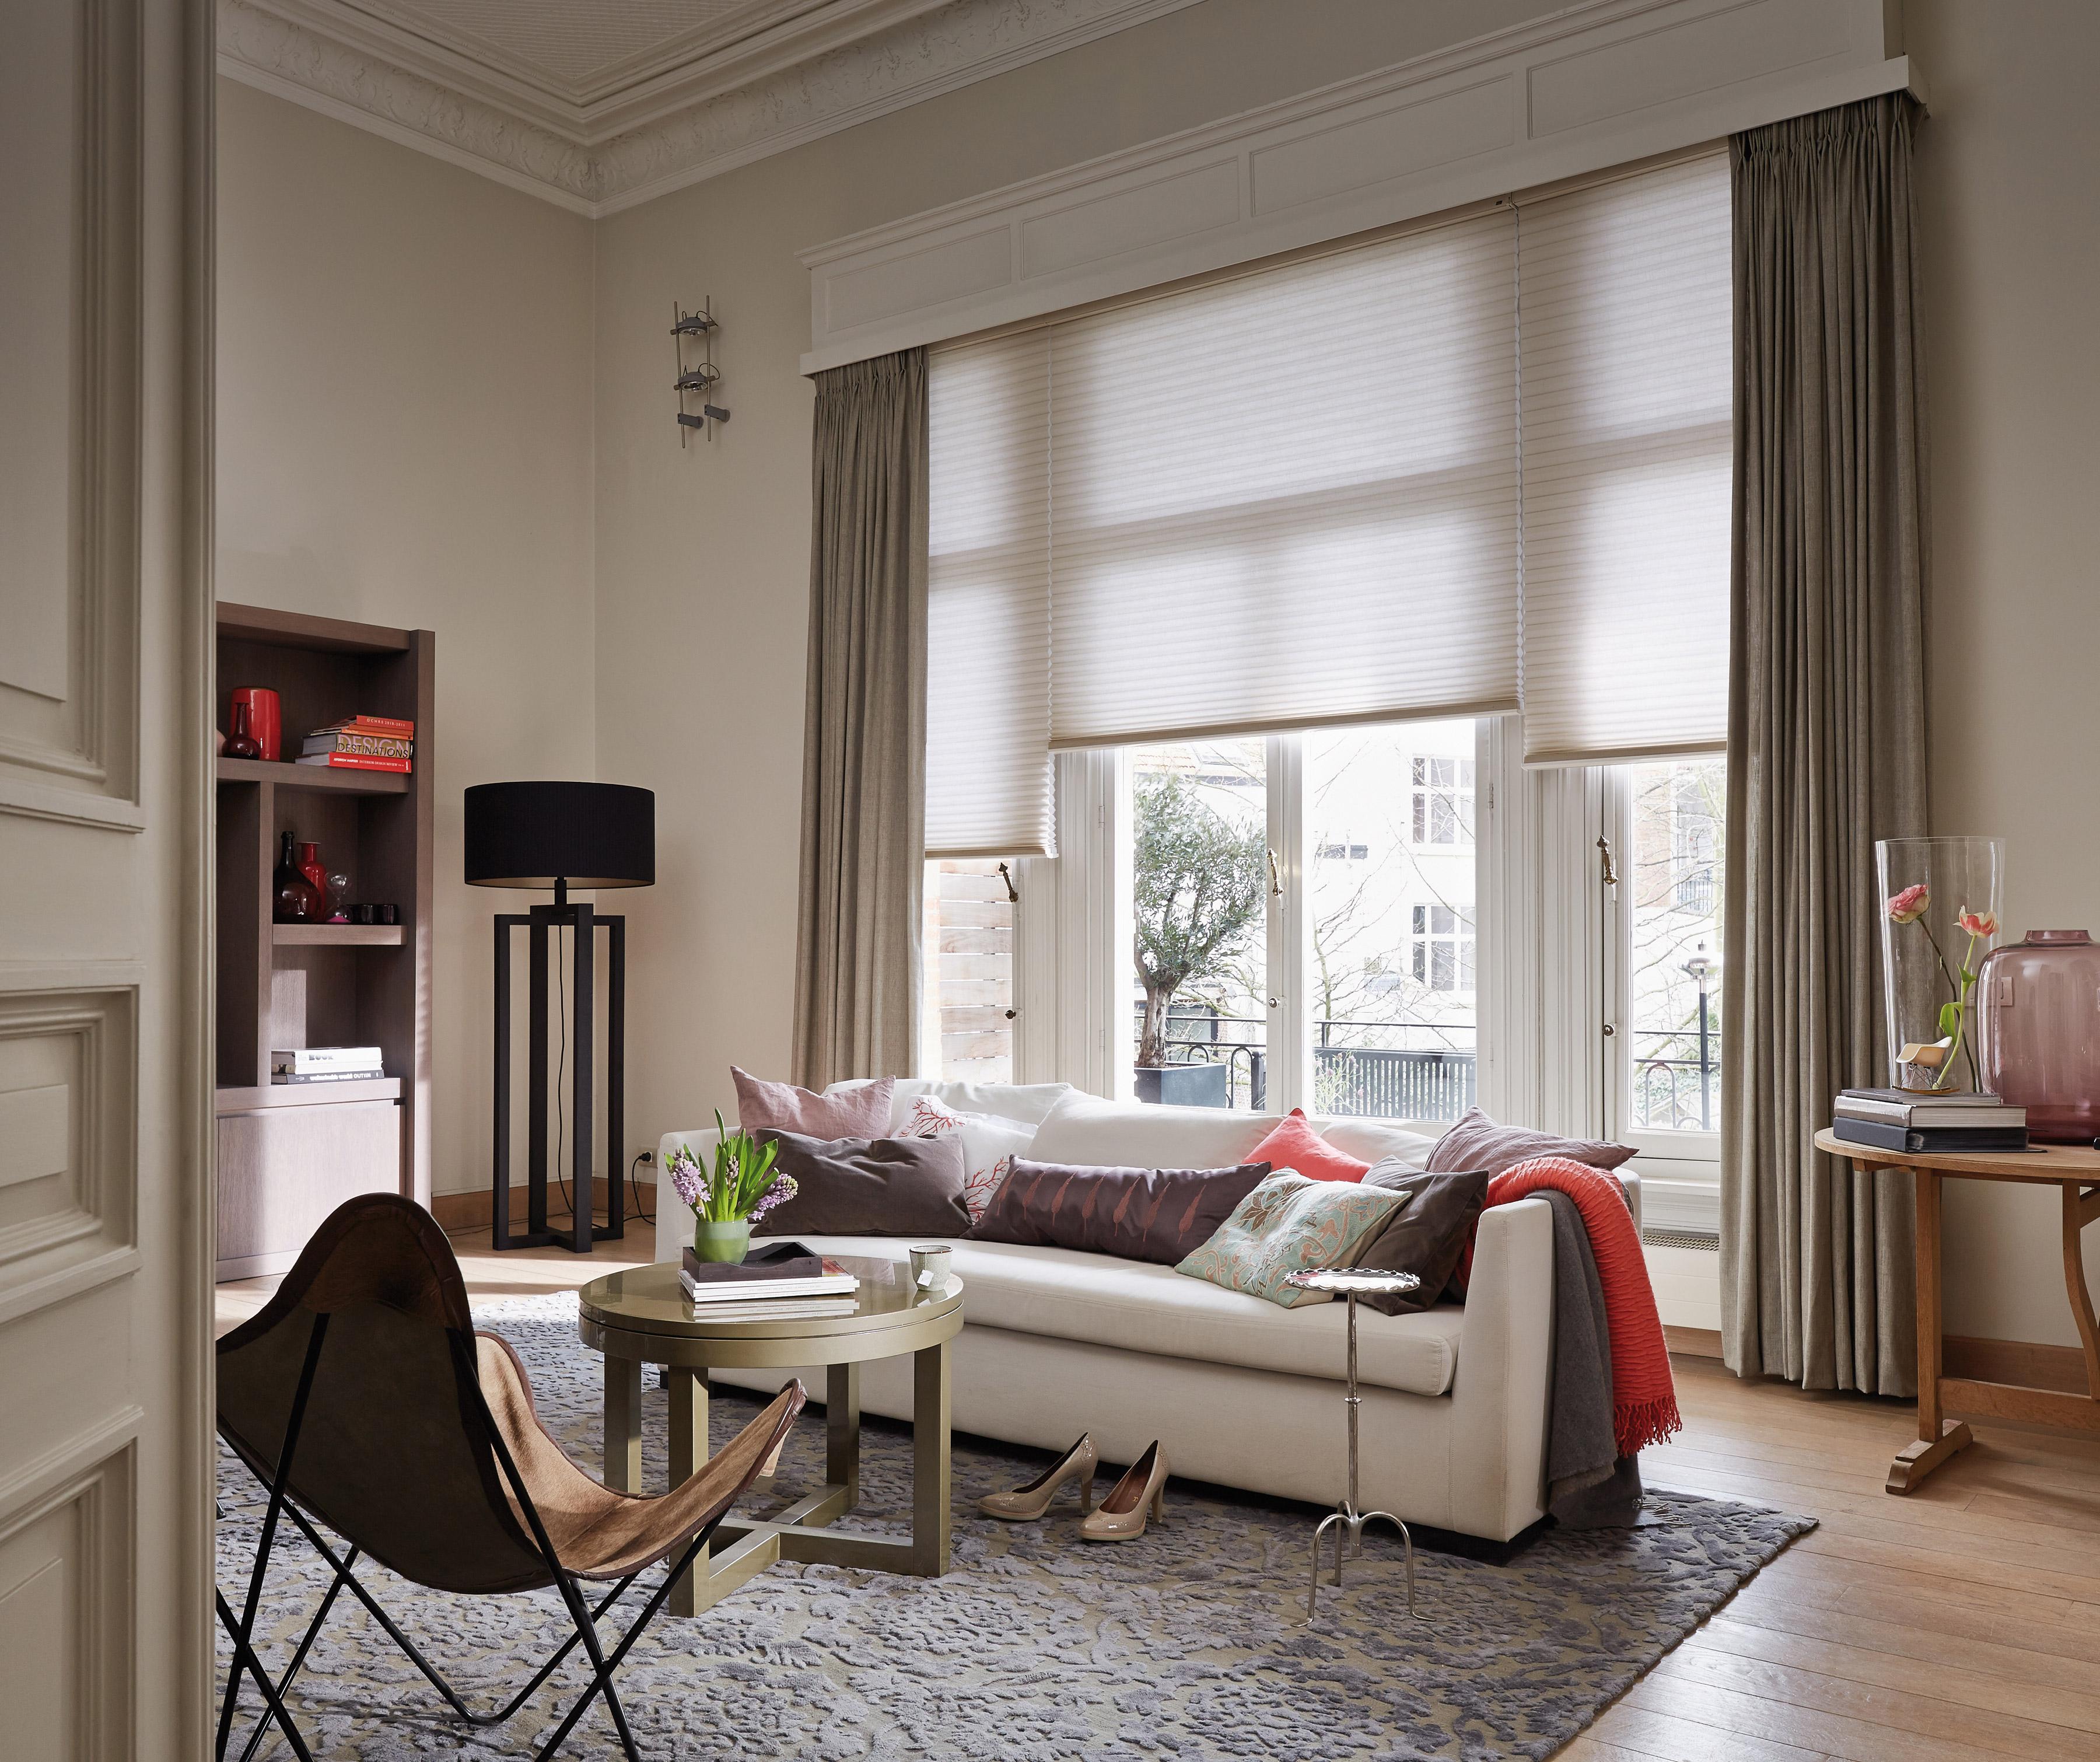 plissee duette heim haus. Black Bedroom Furniture Sets. Home Design Ideas